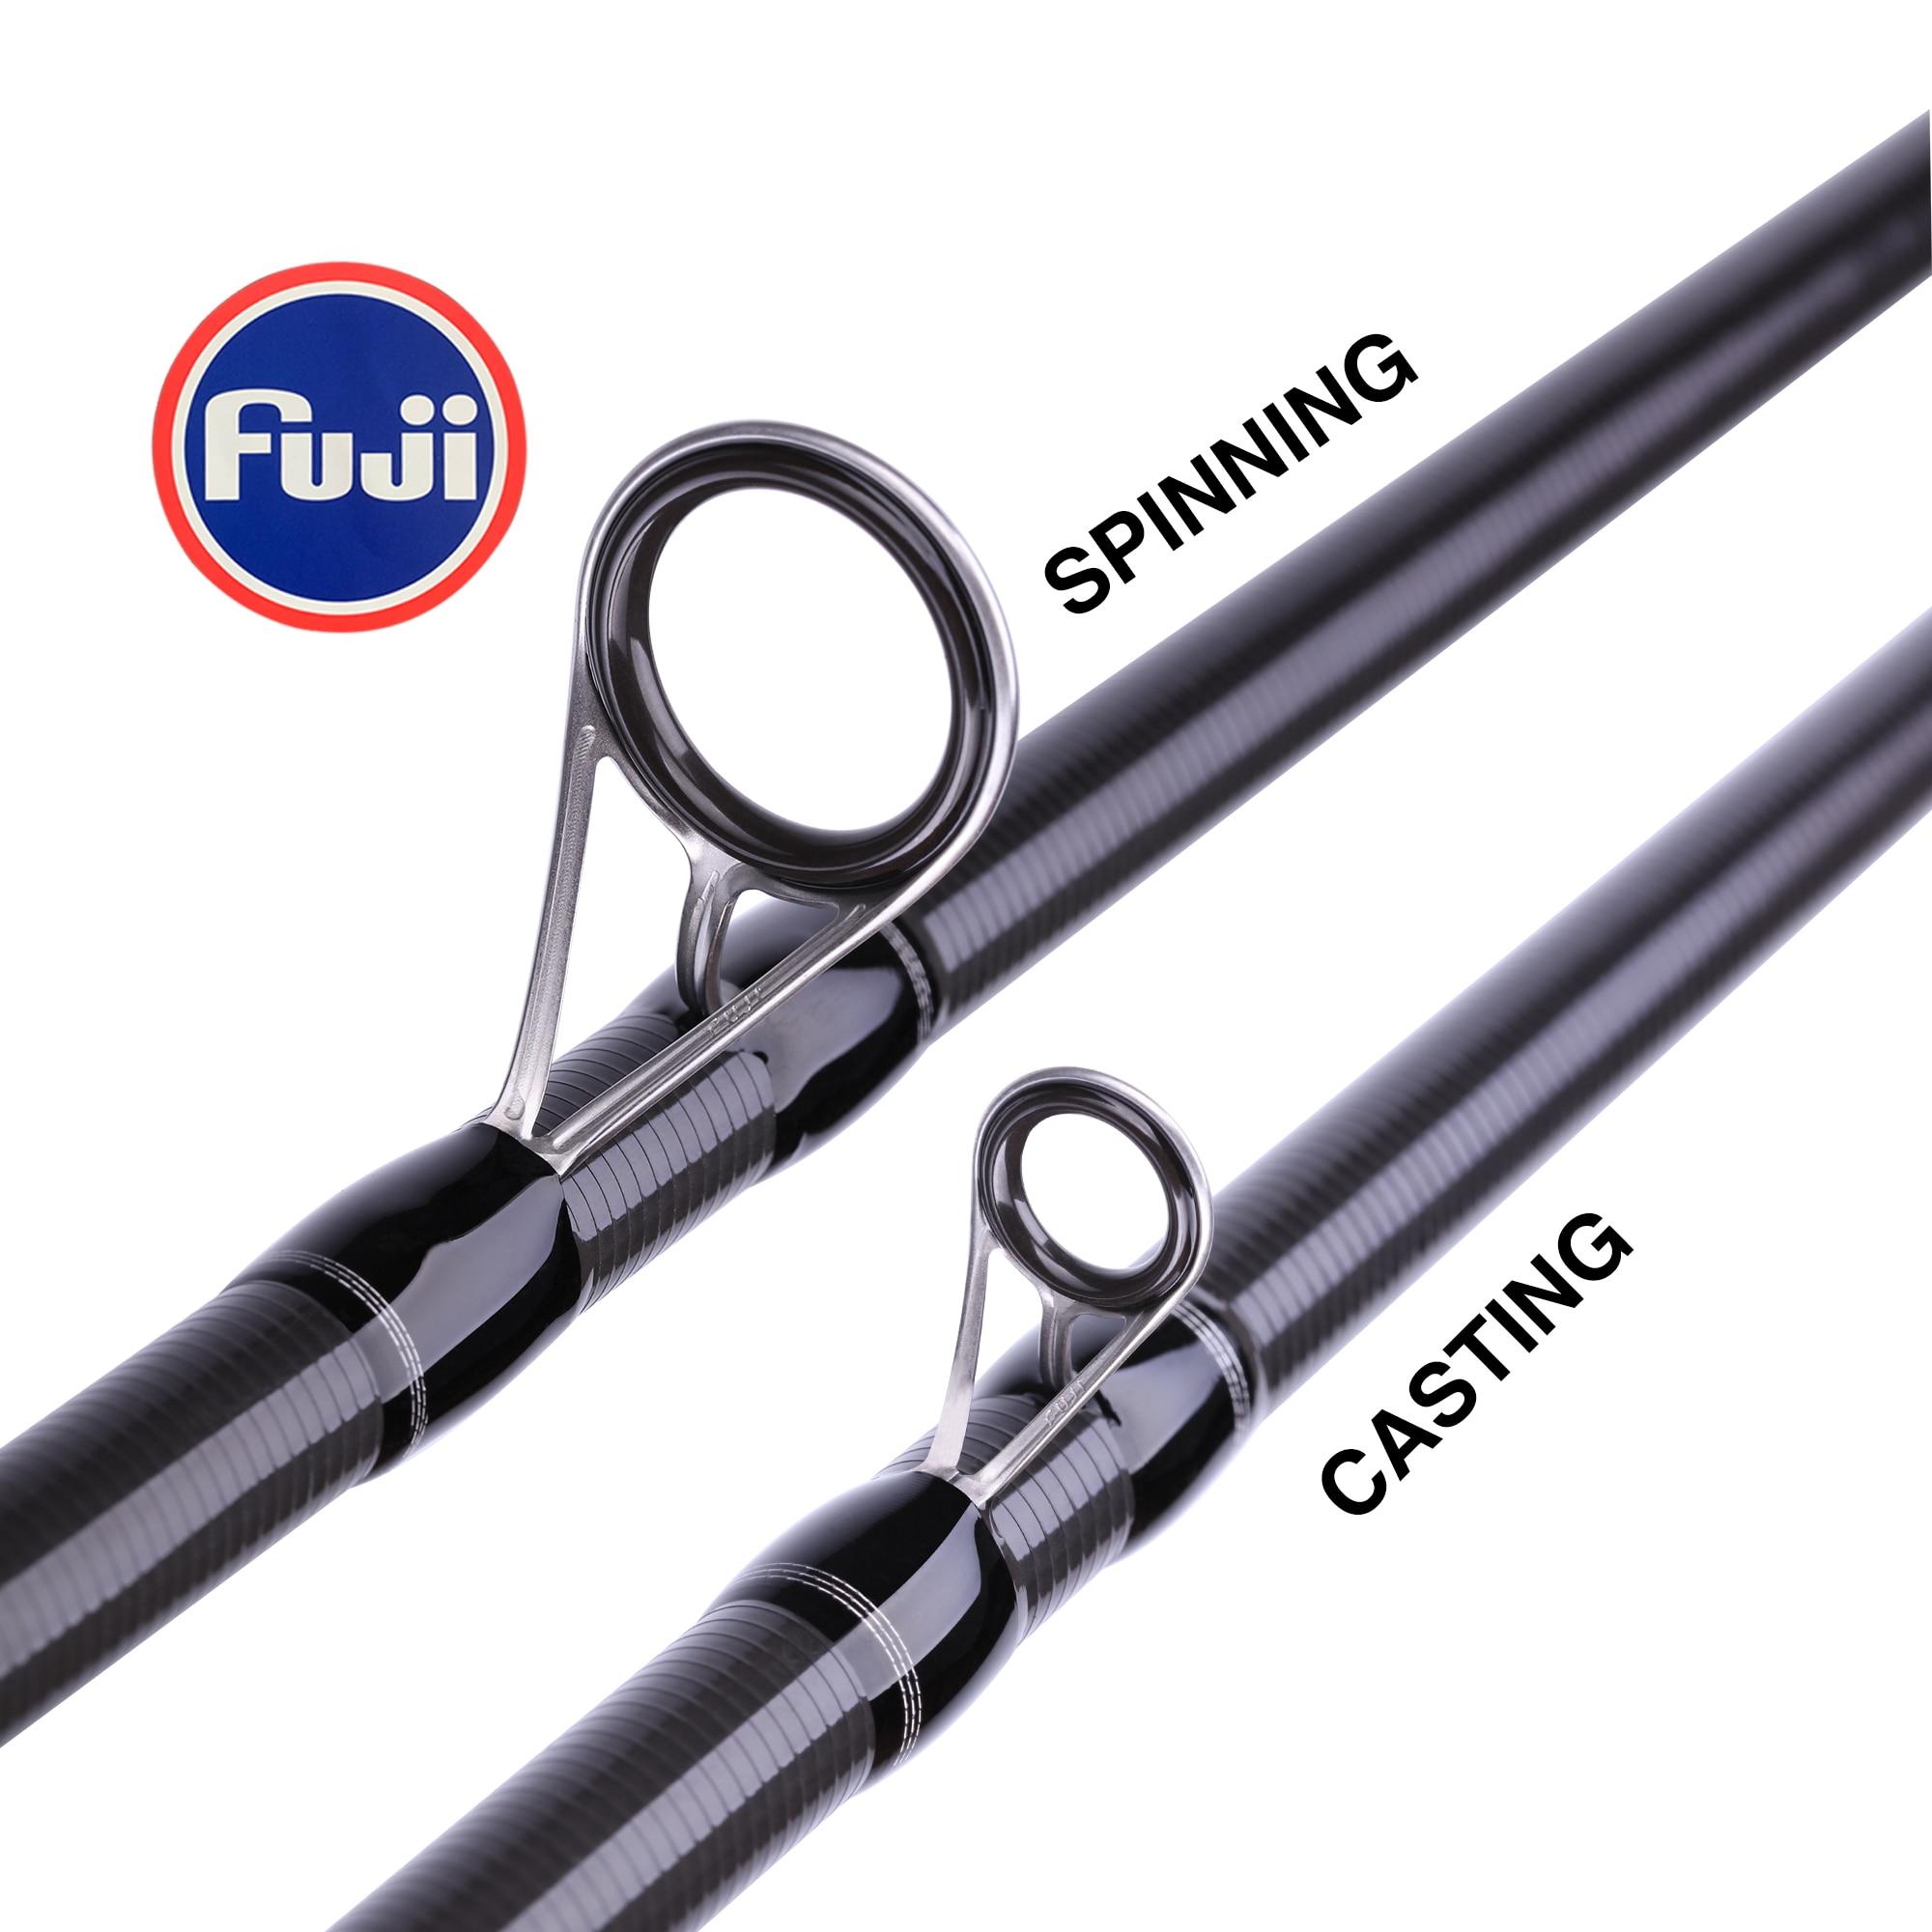 MIFINE MAXIMUS Spinning/Baitcast Rod  4